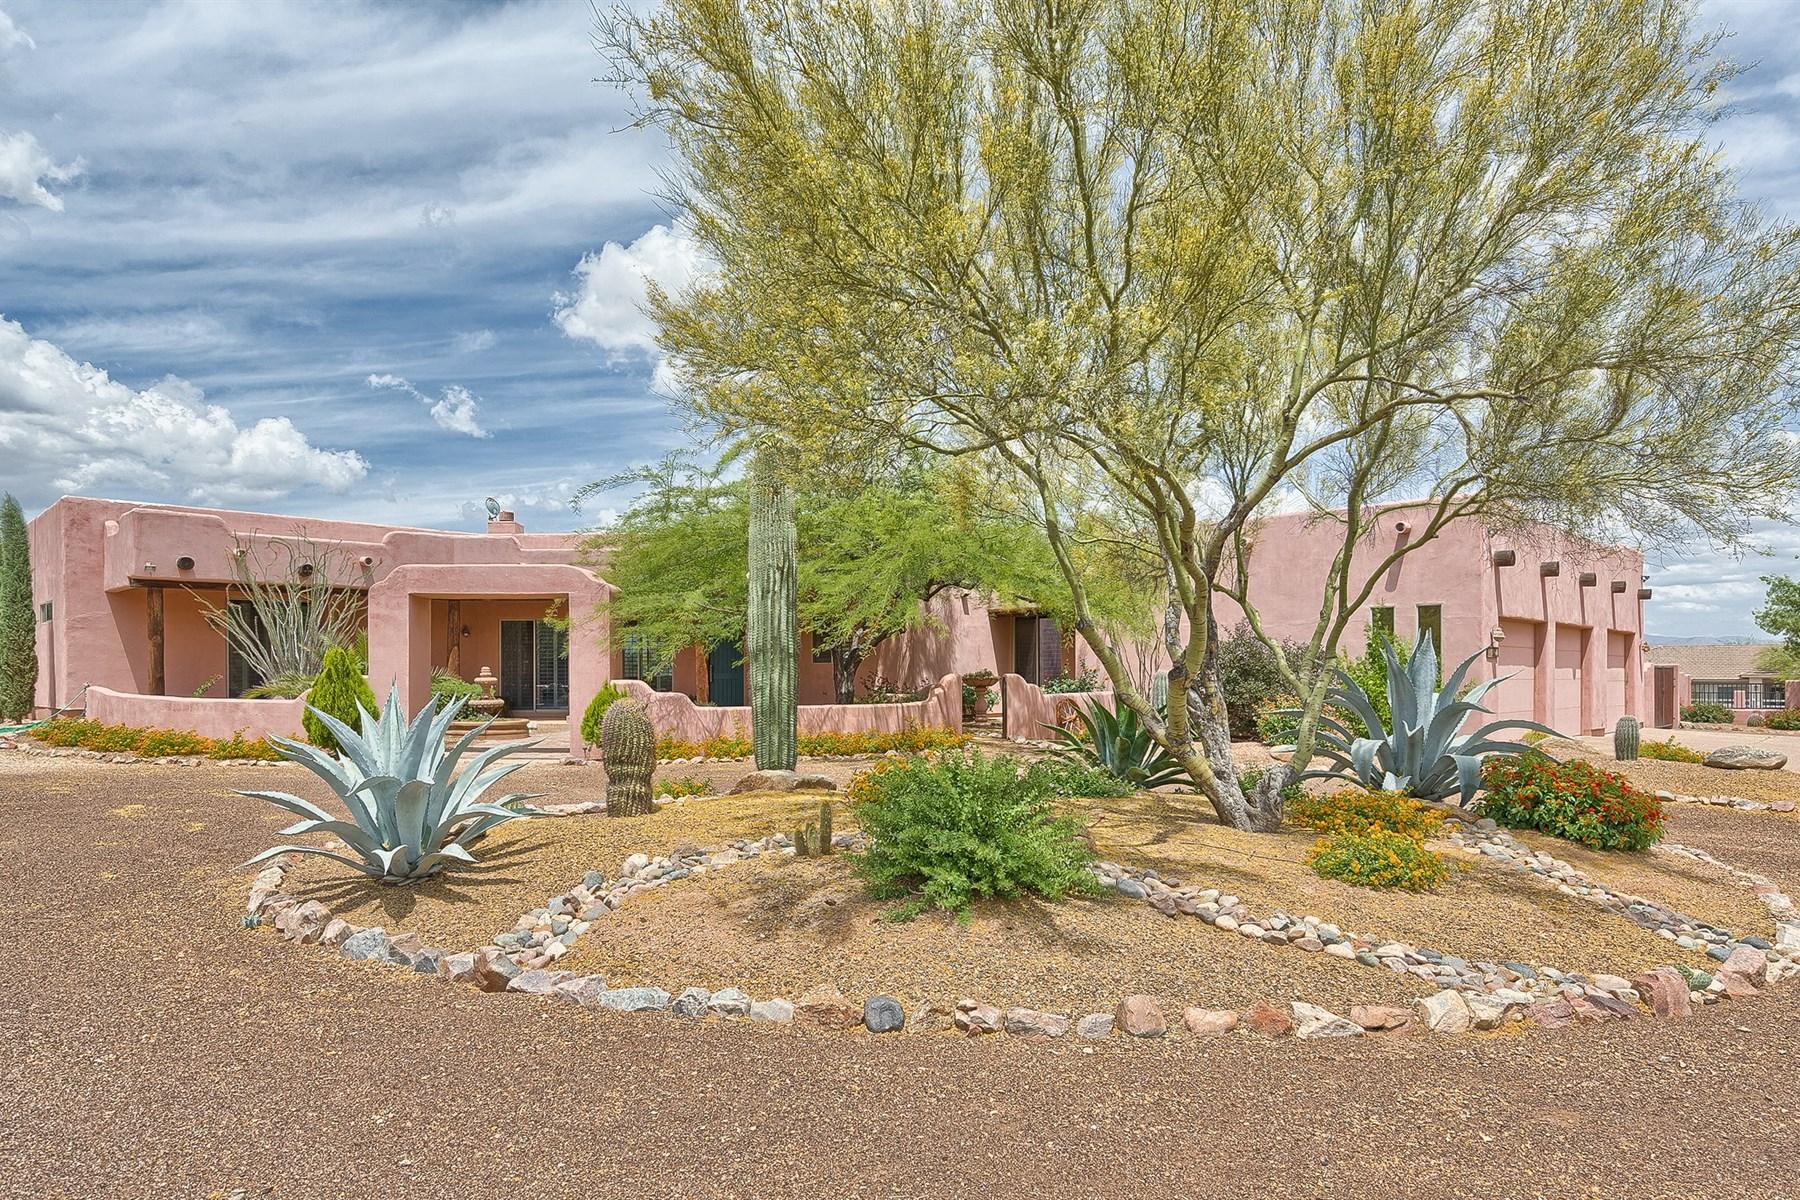 Casa Unifamiliar por un Venta en North Scottsdale custom built 1.3 acre territorial style home. 14516 E Roy Rodgers RD Scottsdale, Arizona 85262 Estados Unidos